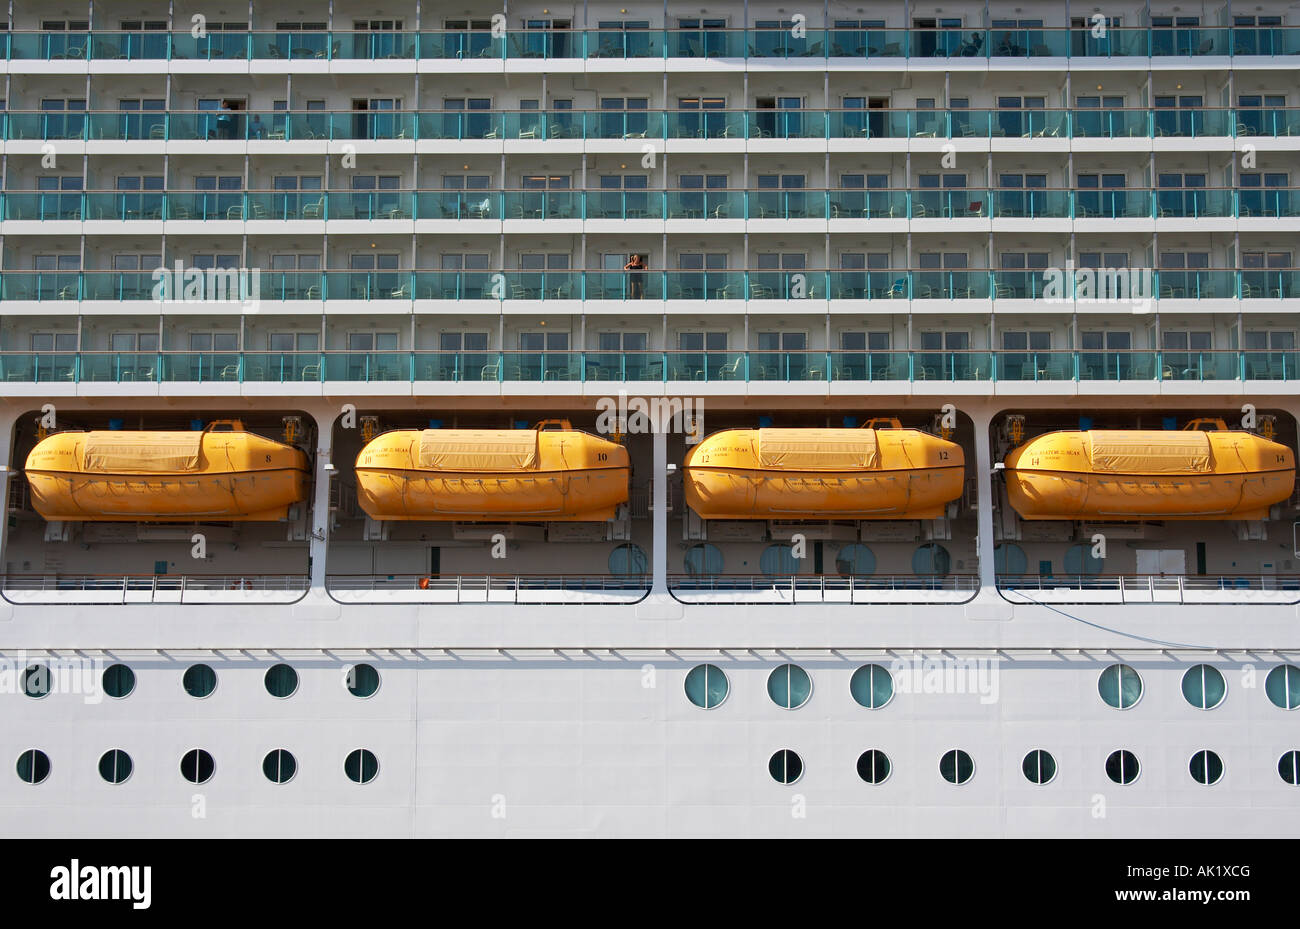 Cruise ship 'Navigator of the seas' visiting Las Palmas, Gran Canaria. - Stock Image